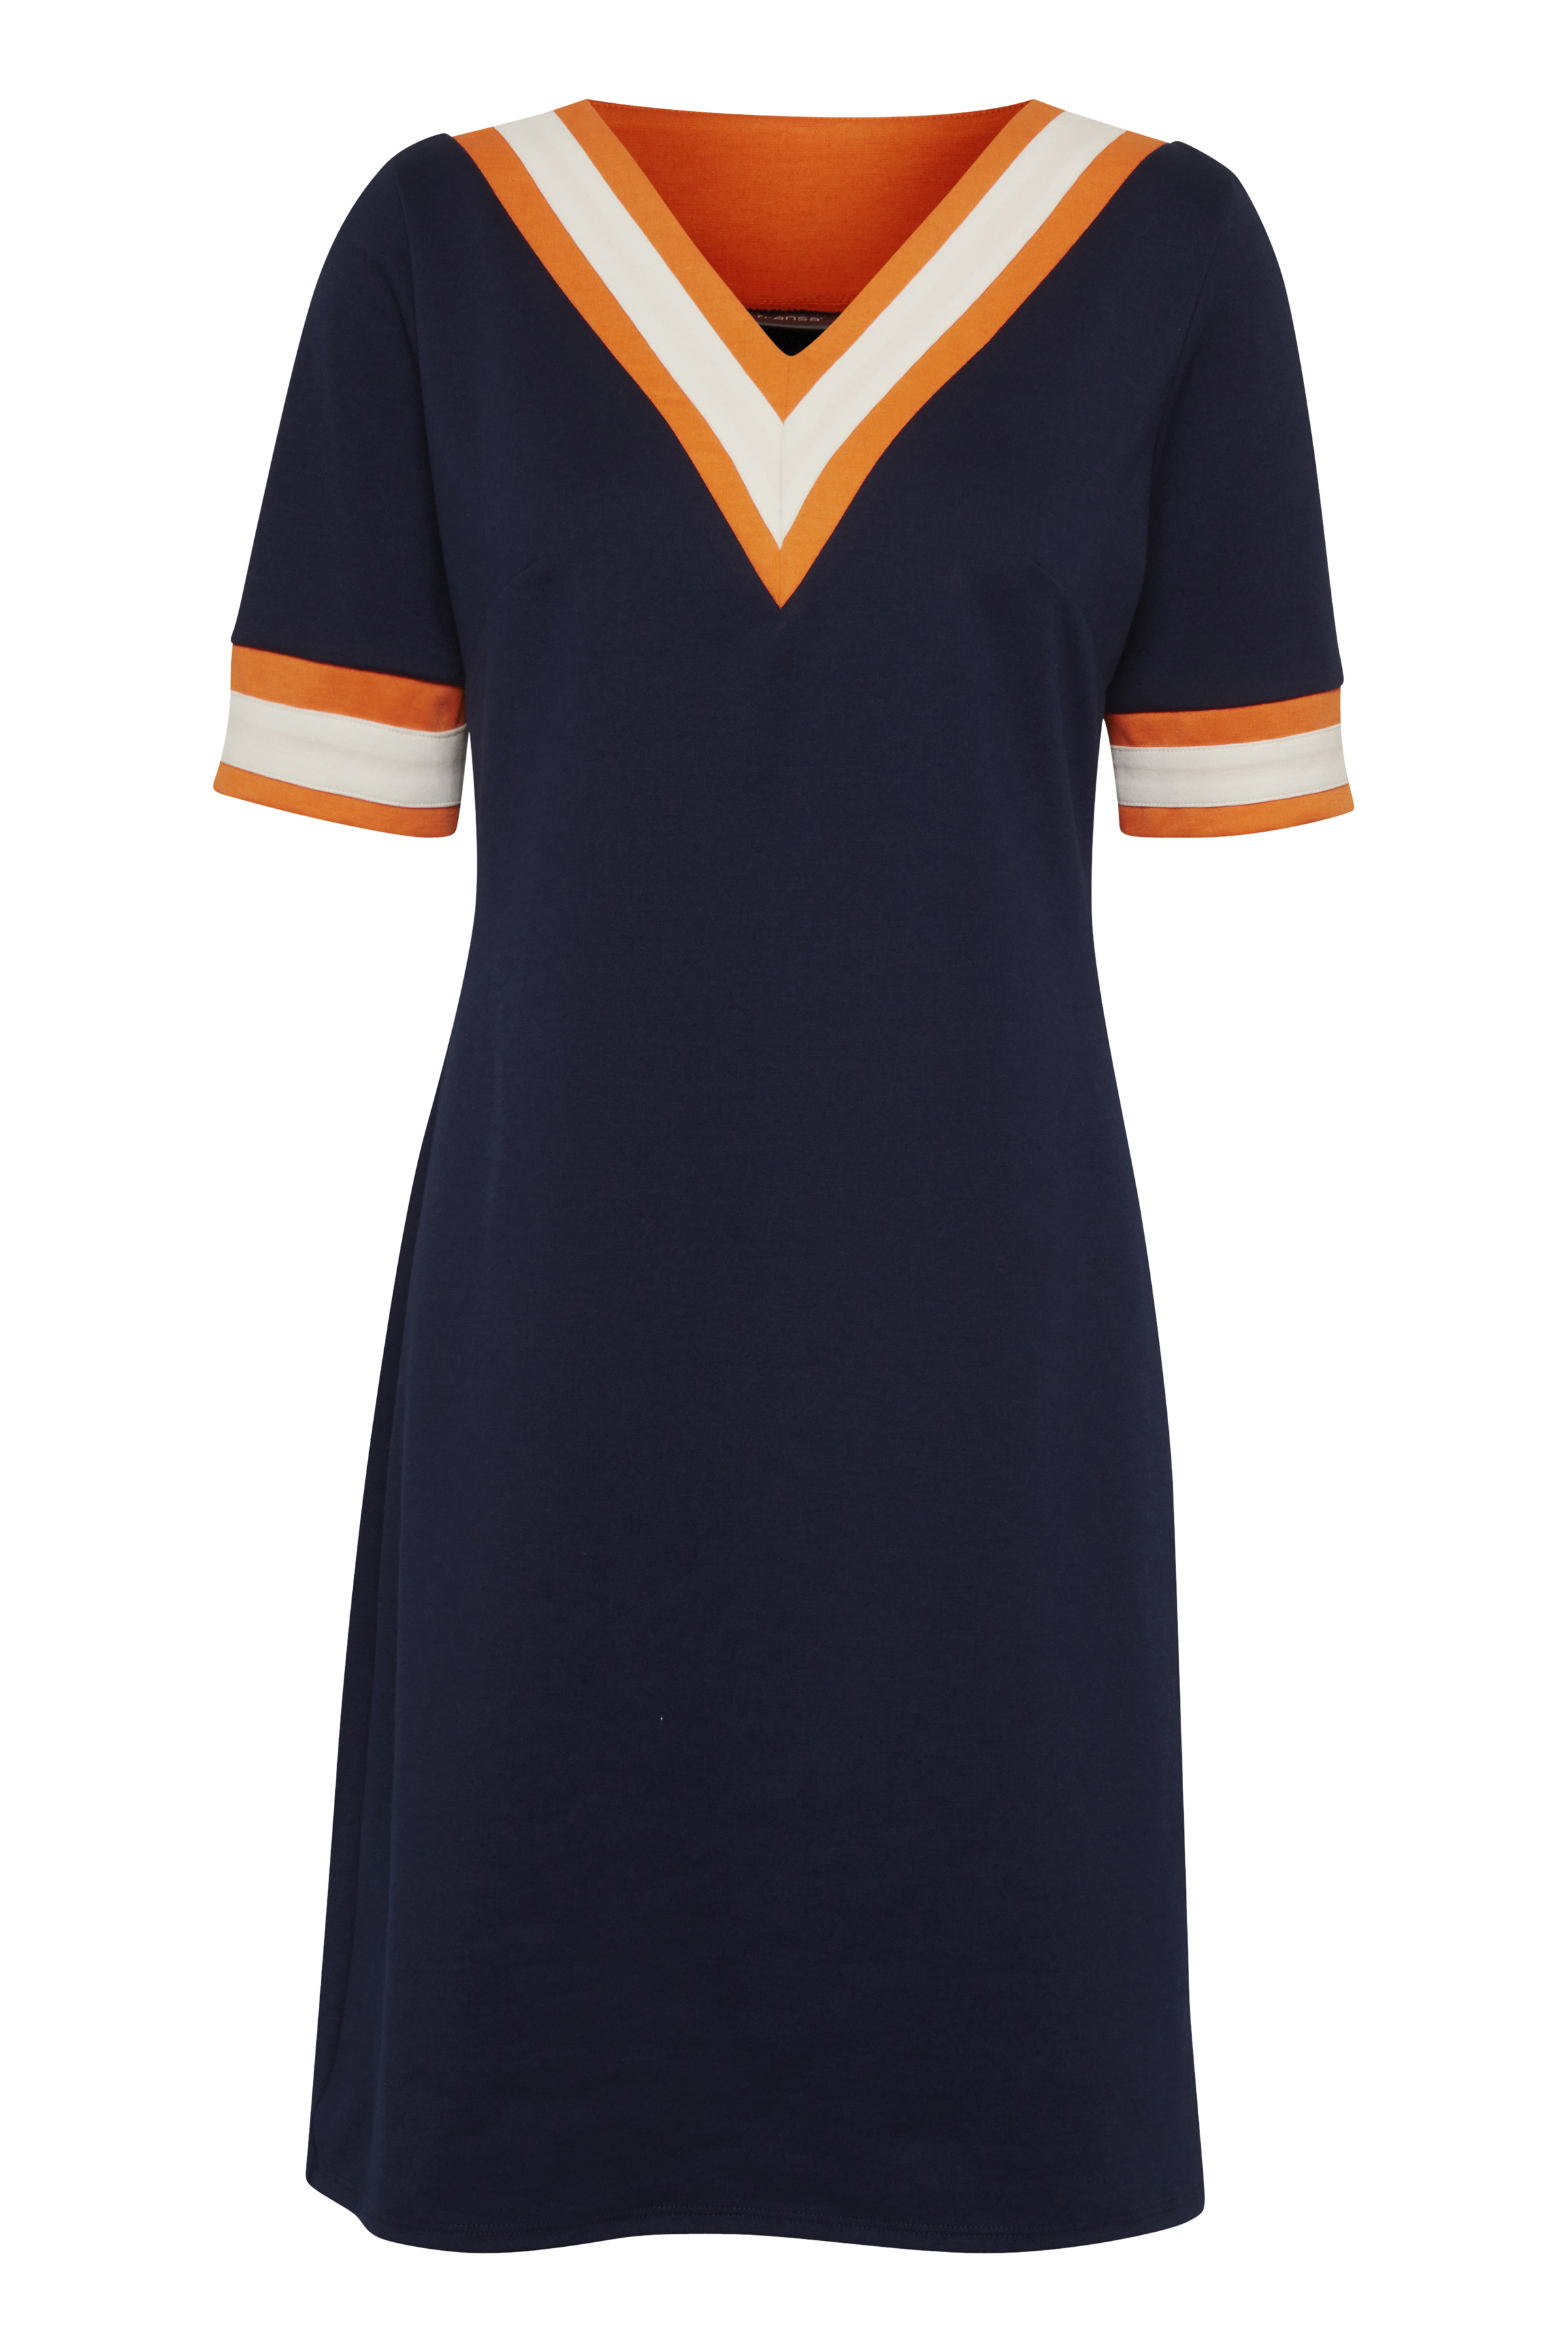 Fransa Dame Jersey kjole - Marineblå/orange